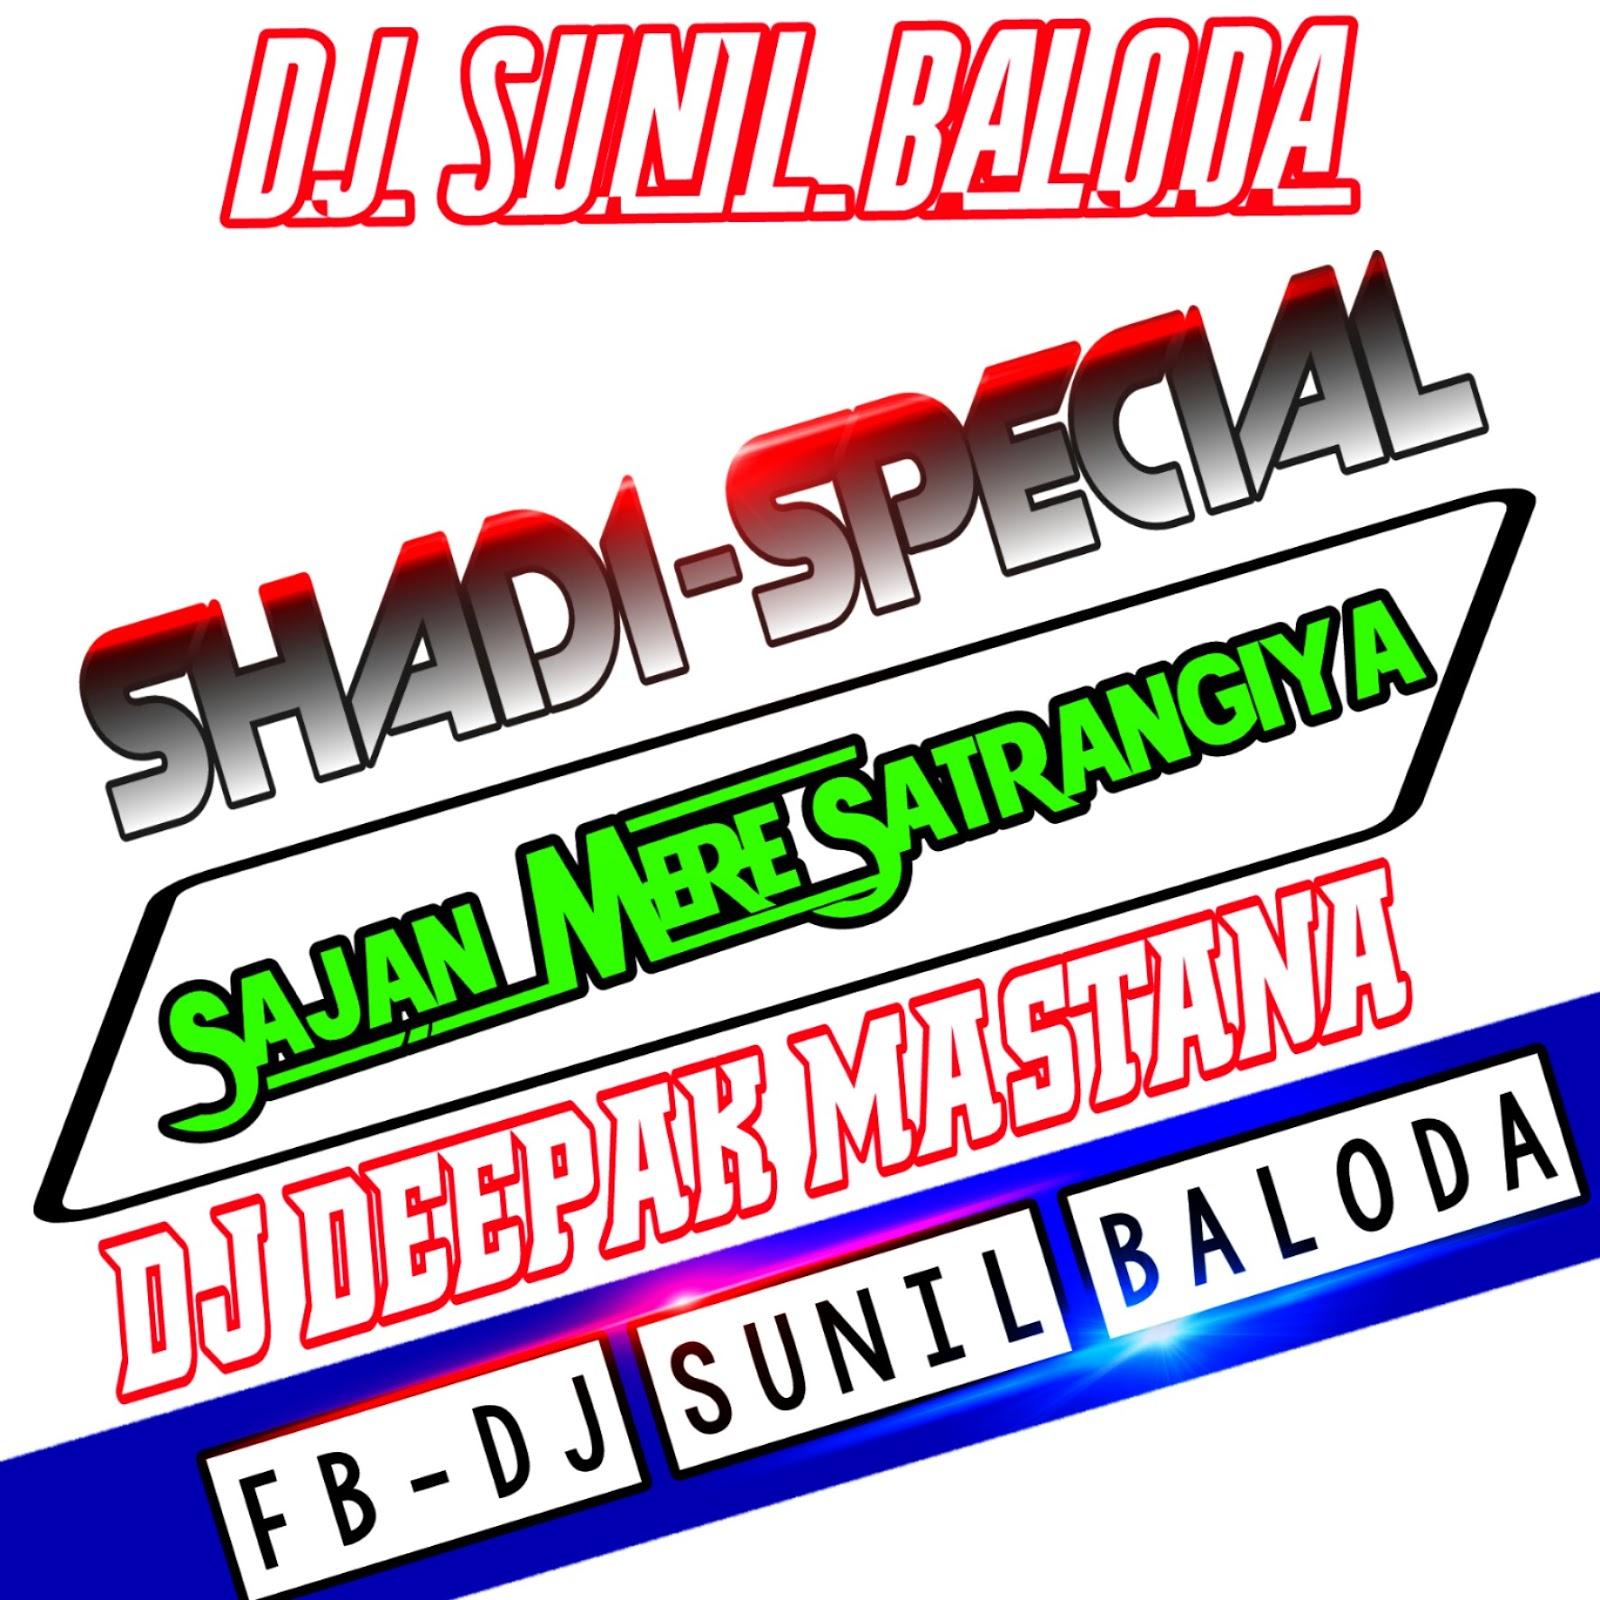 SAJAN MERE SATRANGIYA PANJABI REMIX-PECK DJ SUNIL BALODA AND